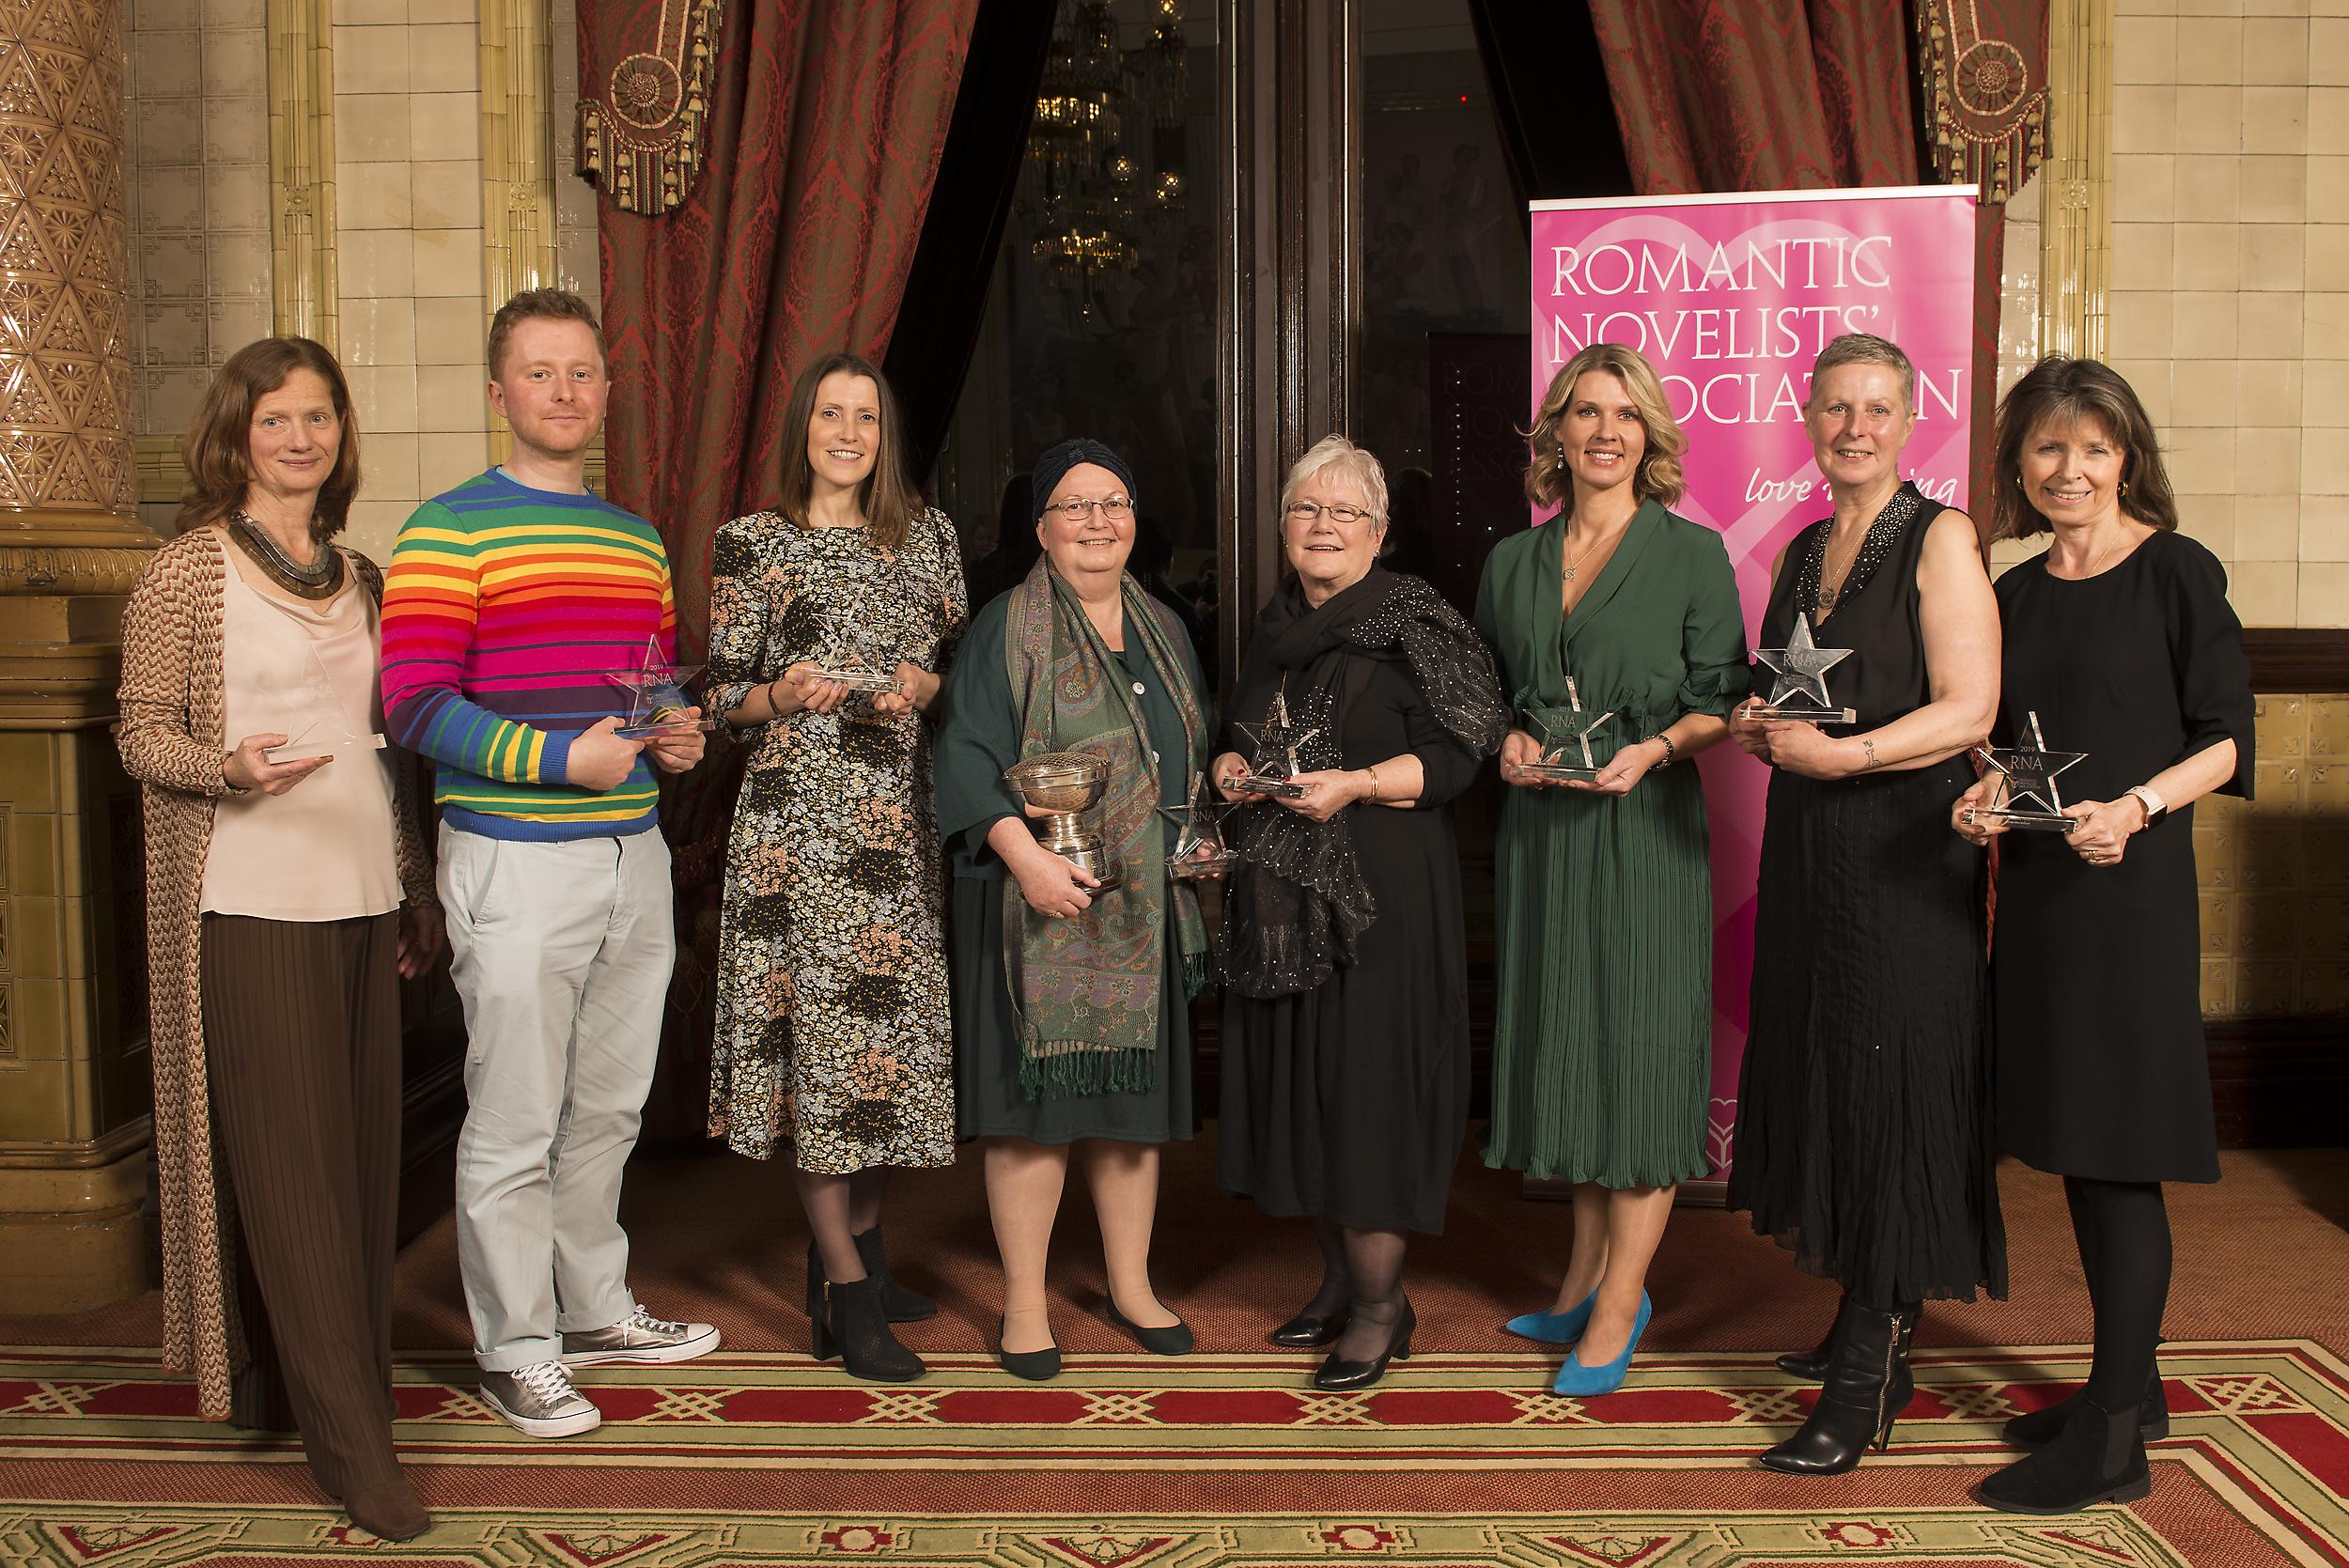 Romantic Novel Awards - Winners Announced - RNA